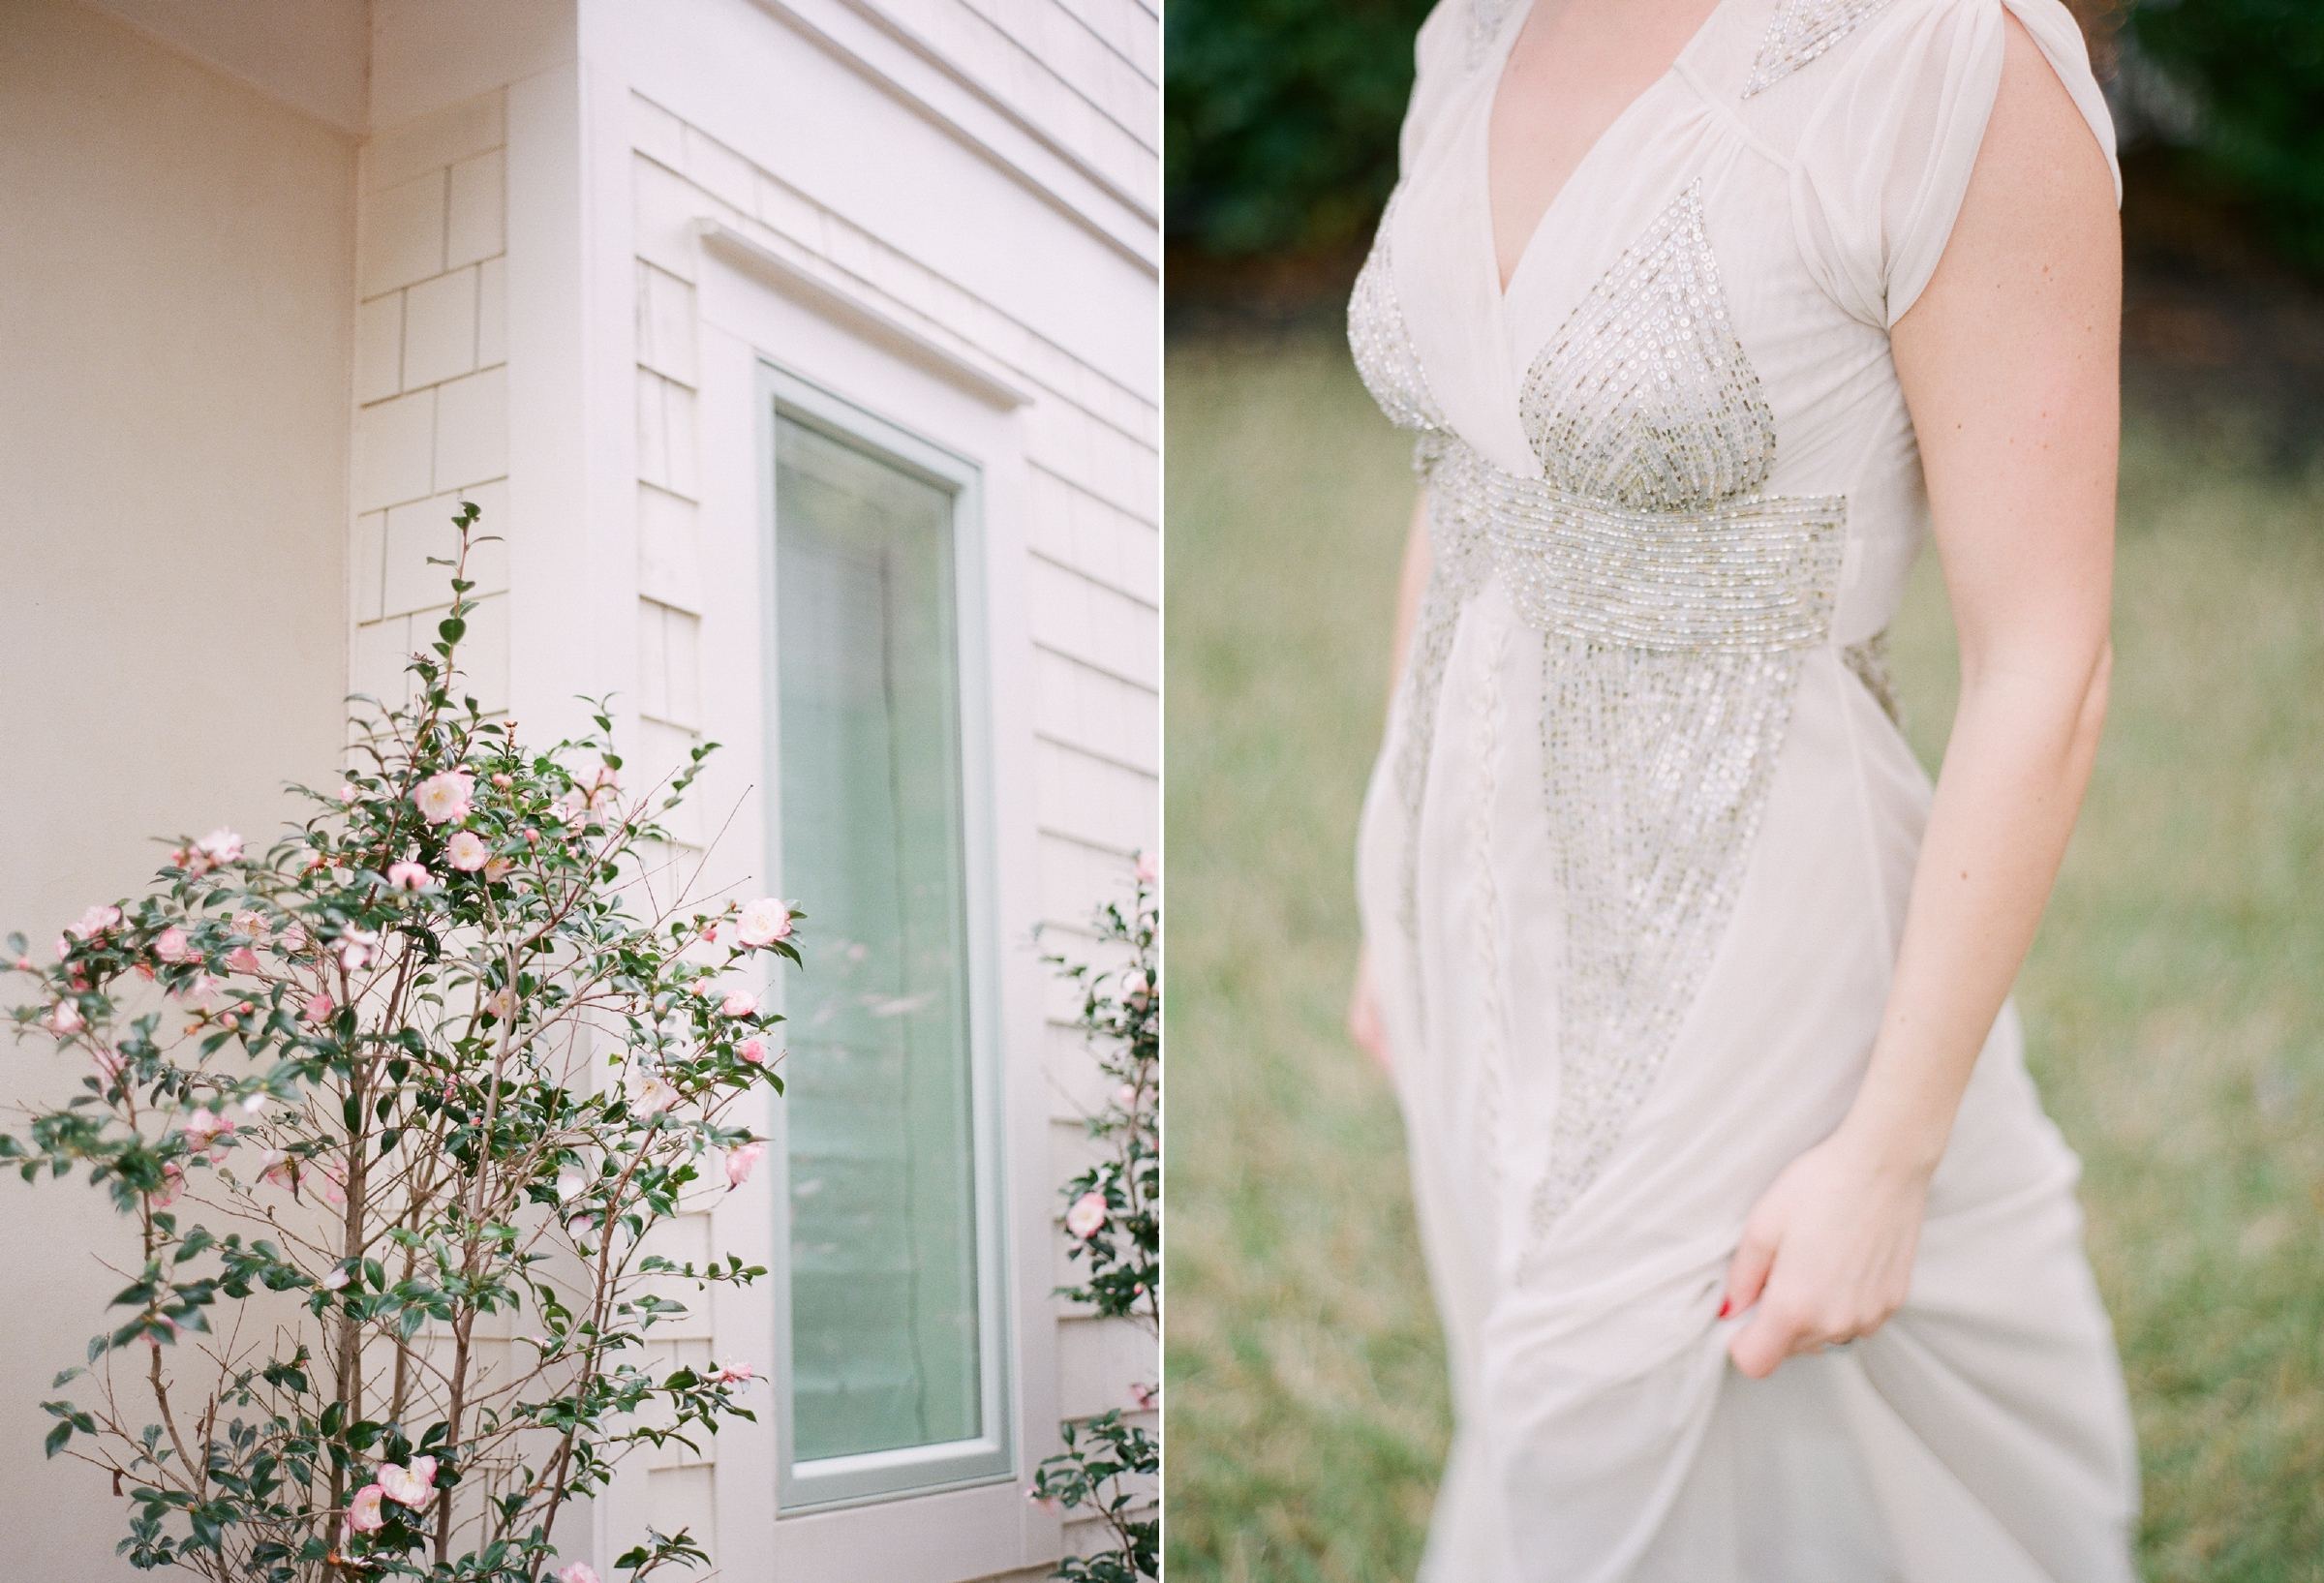 santa_rosa_beach_same_sex_wedding_photographer_shannon_griffin_0015.jpg